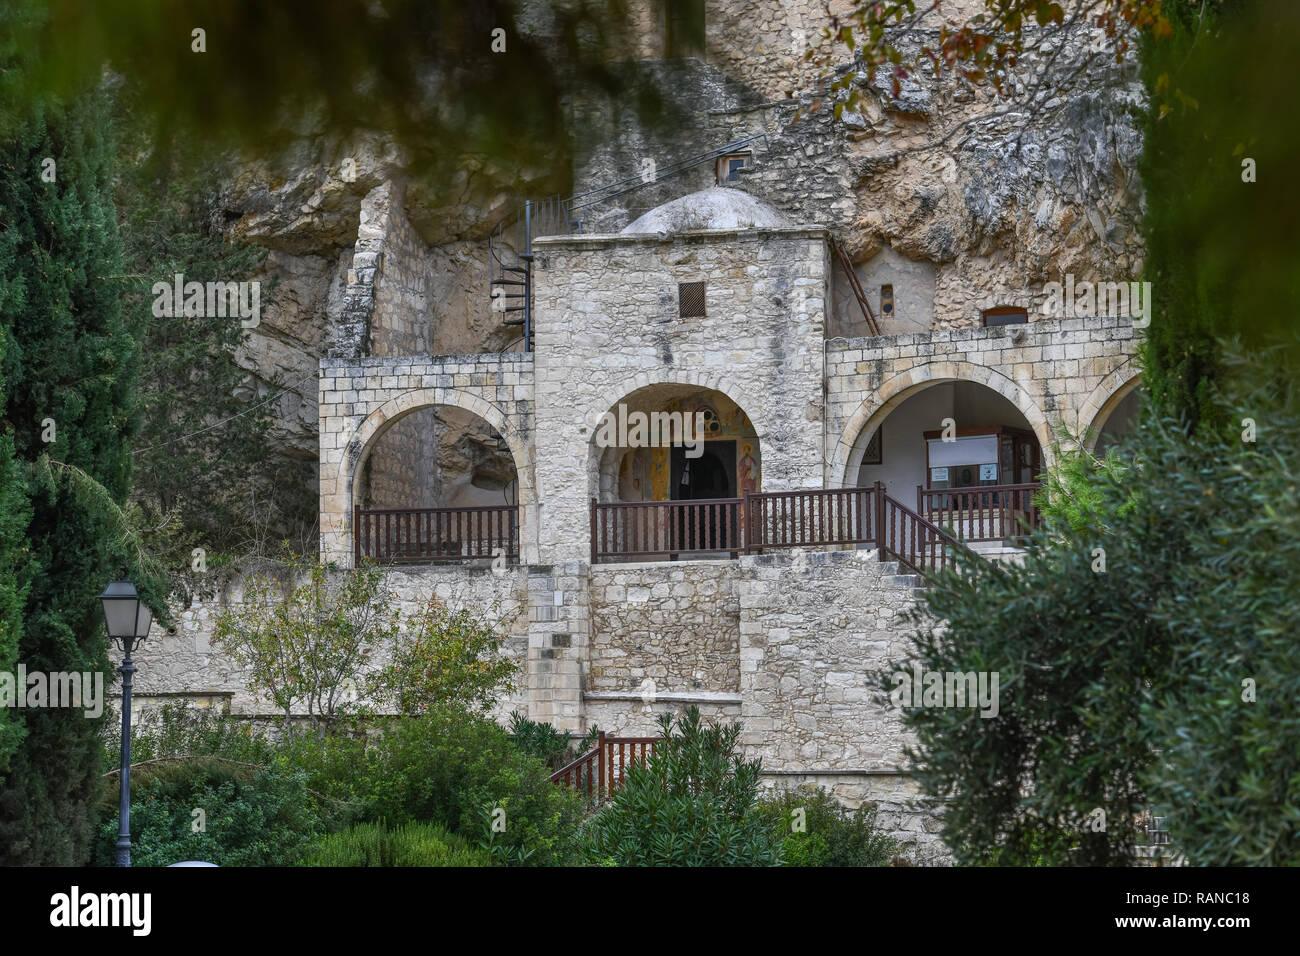 Cave, cloister of agio Neofytos, Cyprus, Hoehle, Kloster Agios Neofytos, Zypern - Stock Image